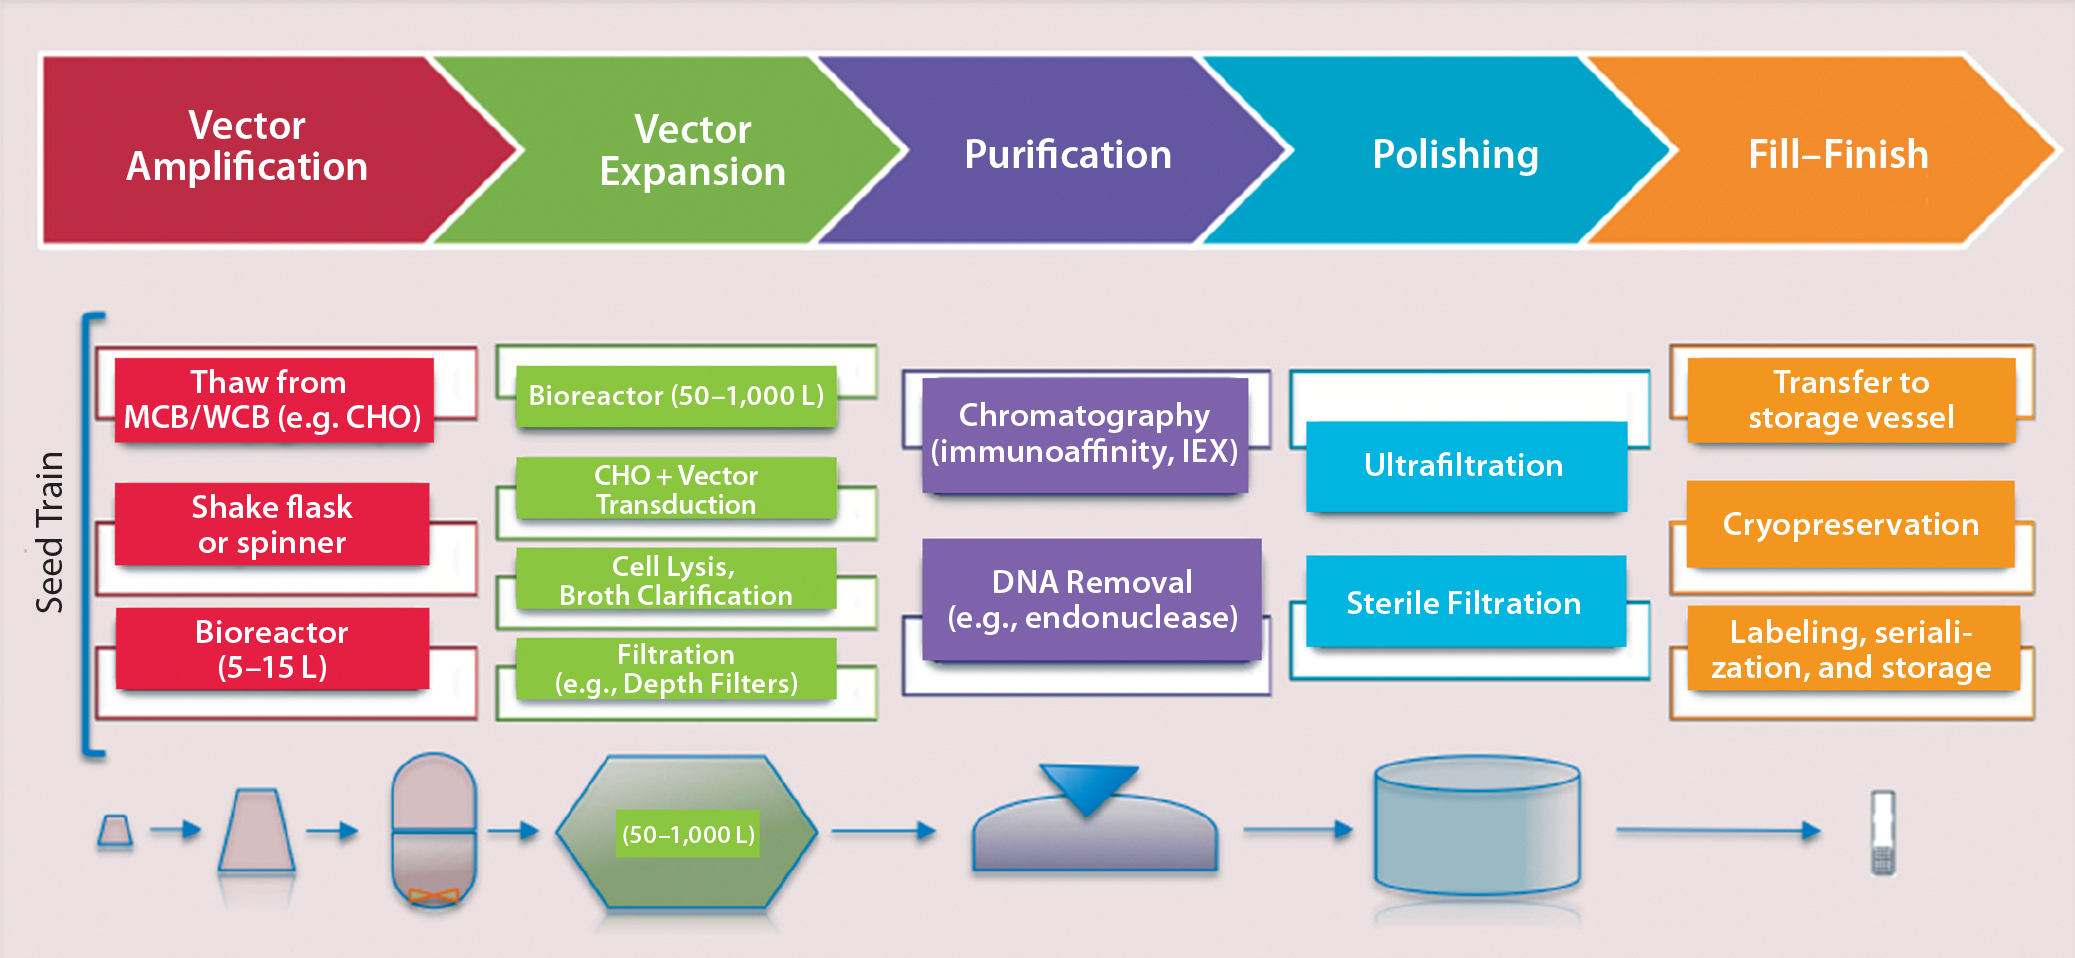 2075x958 Emerging Platform Bioprocesses For Viral Vectors And Gene